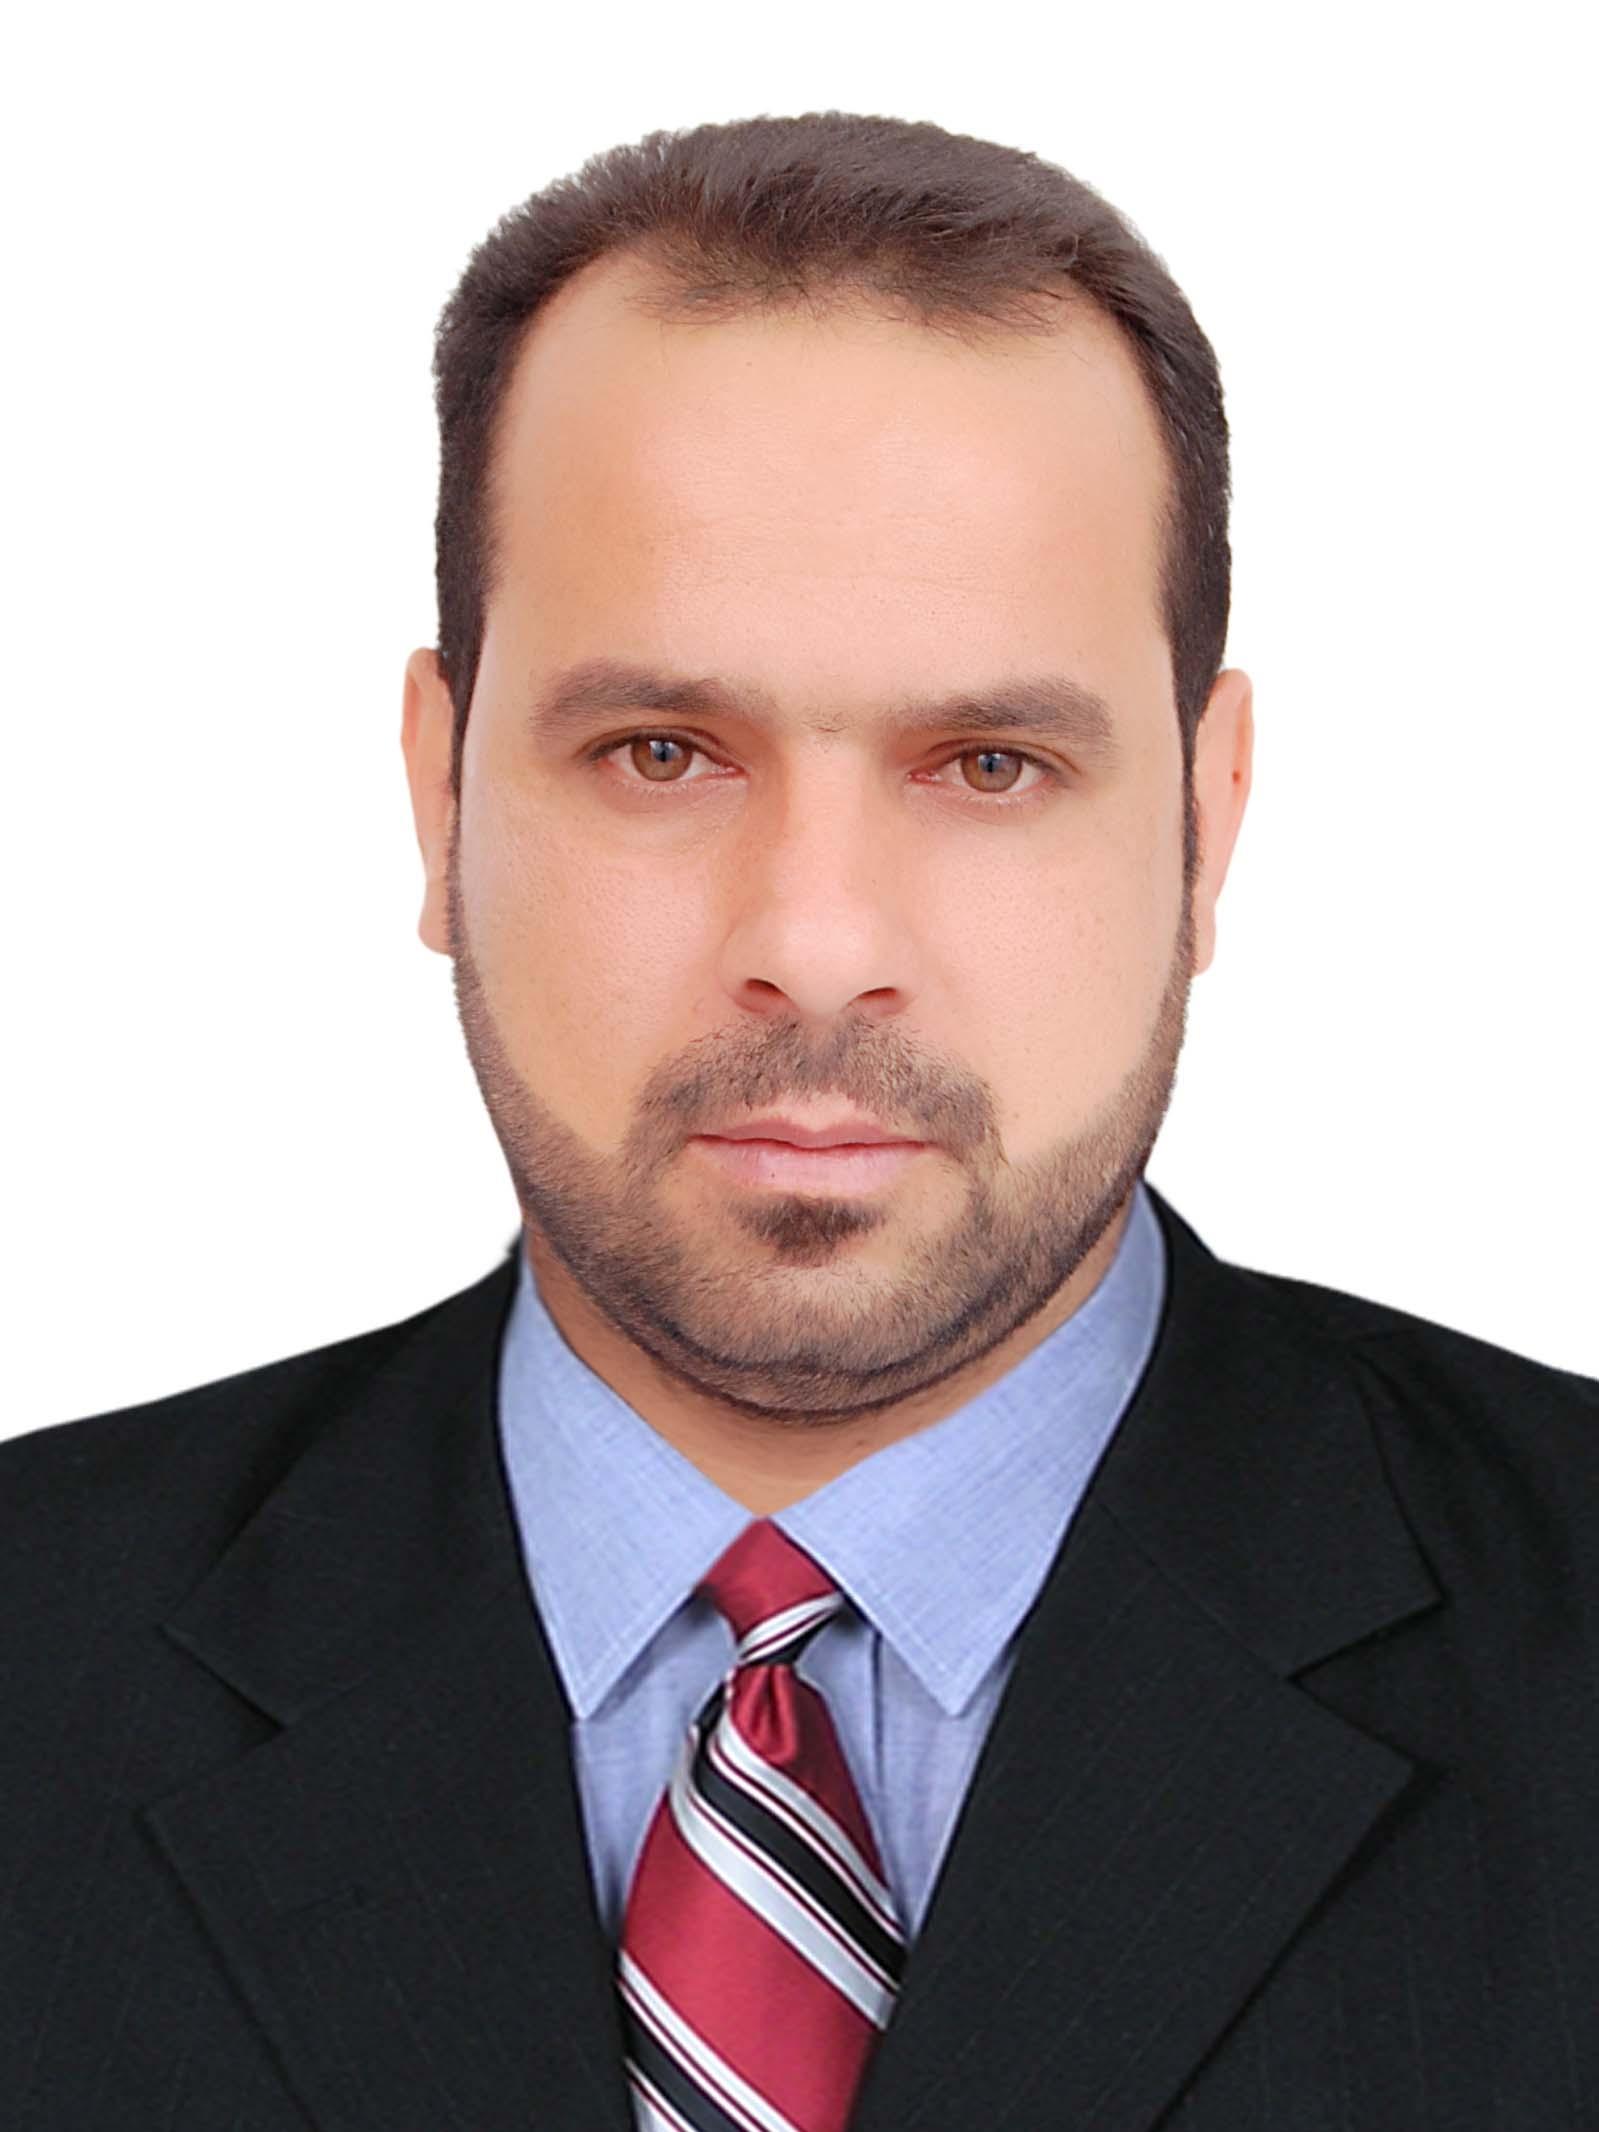 Abdullah Abbas Hussein